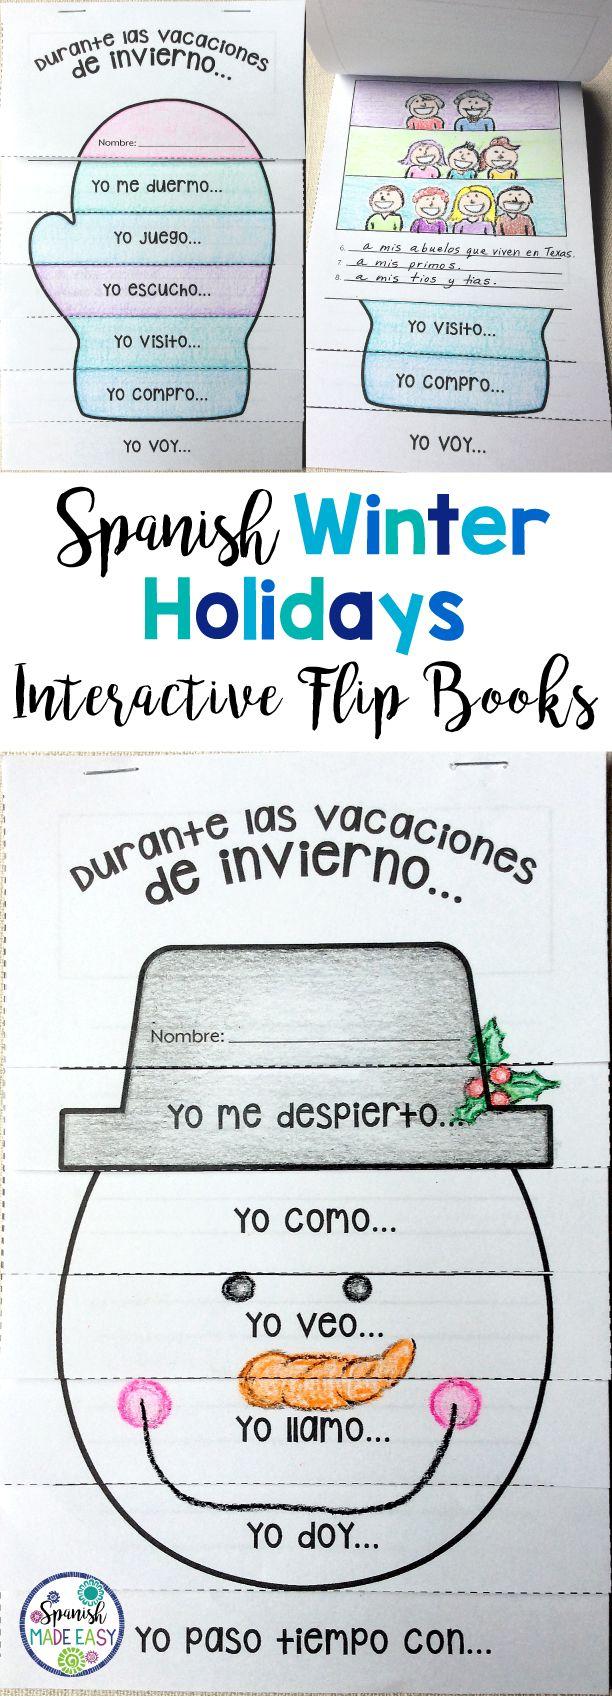 Spanish Winter Holidays Flip Books with sentence starters.